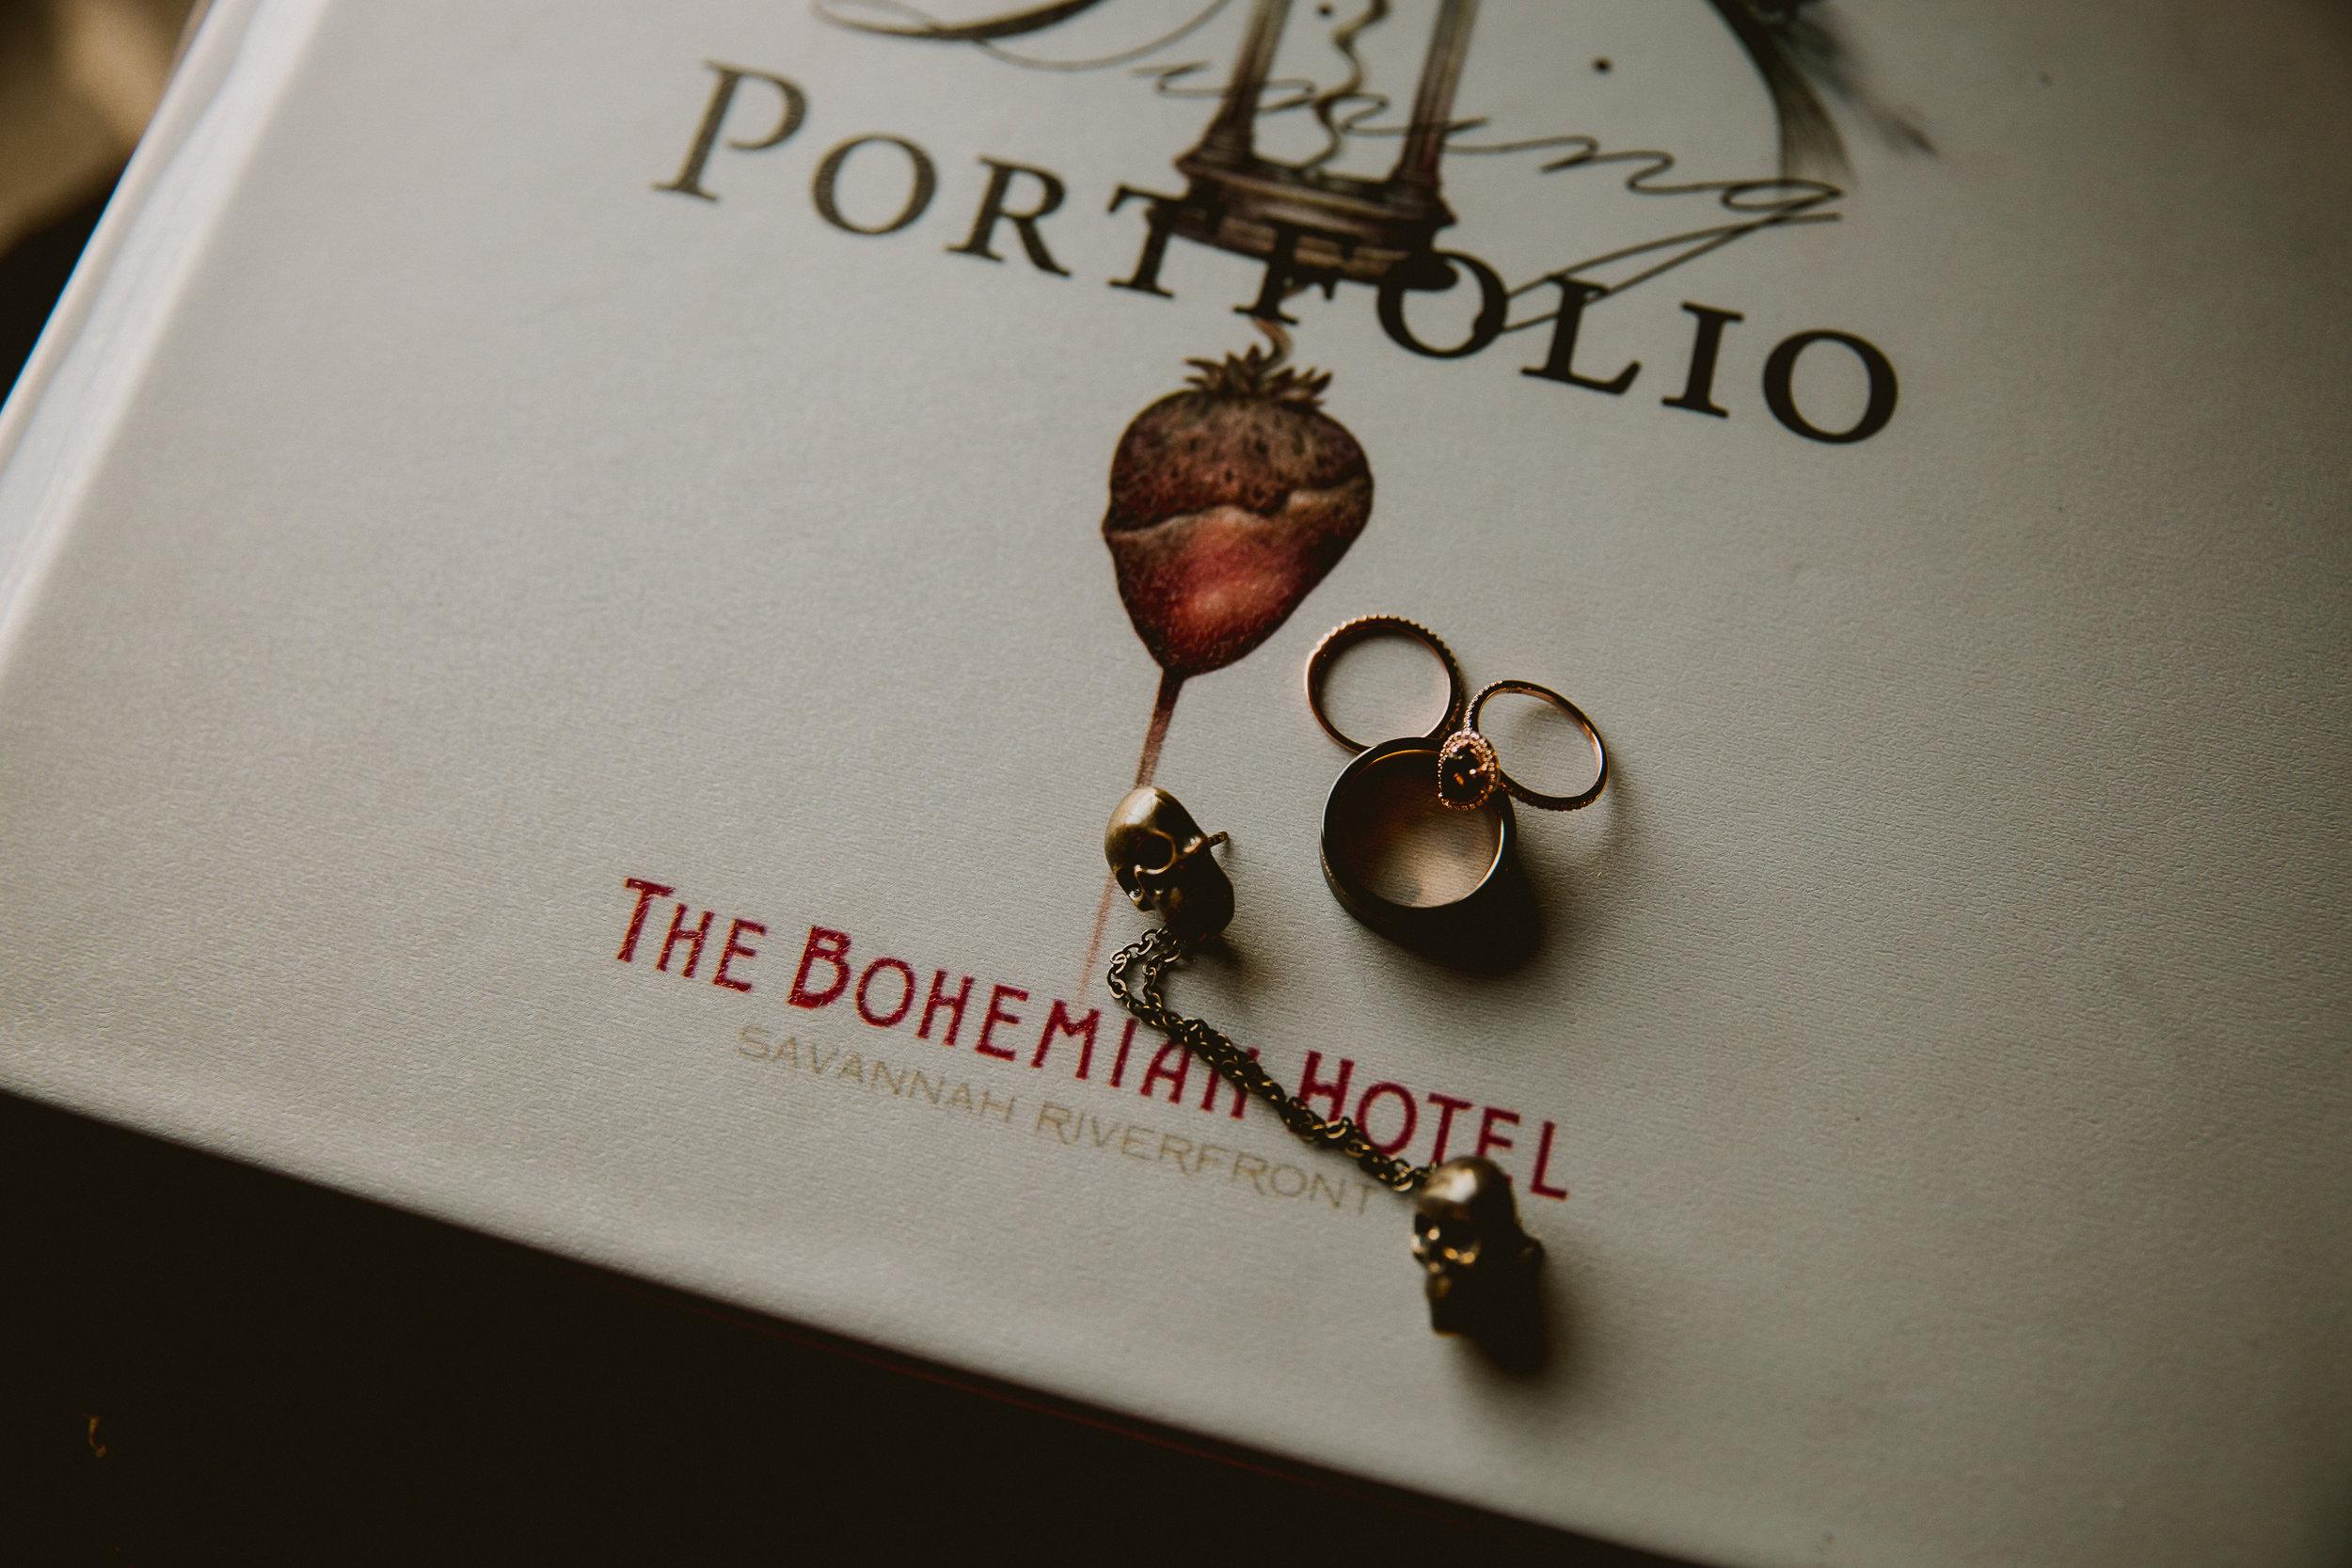 bohemian-hotel-savannah-elopement-kelley-raye-atlanta-wedding-photographer-8.jpg